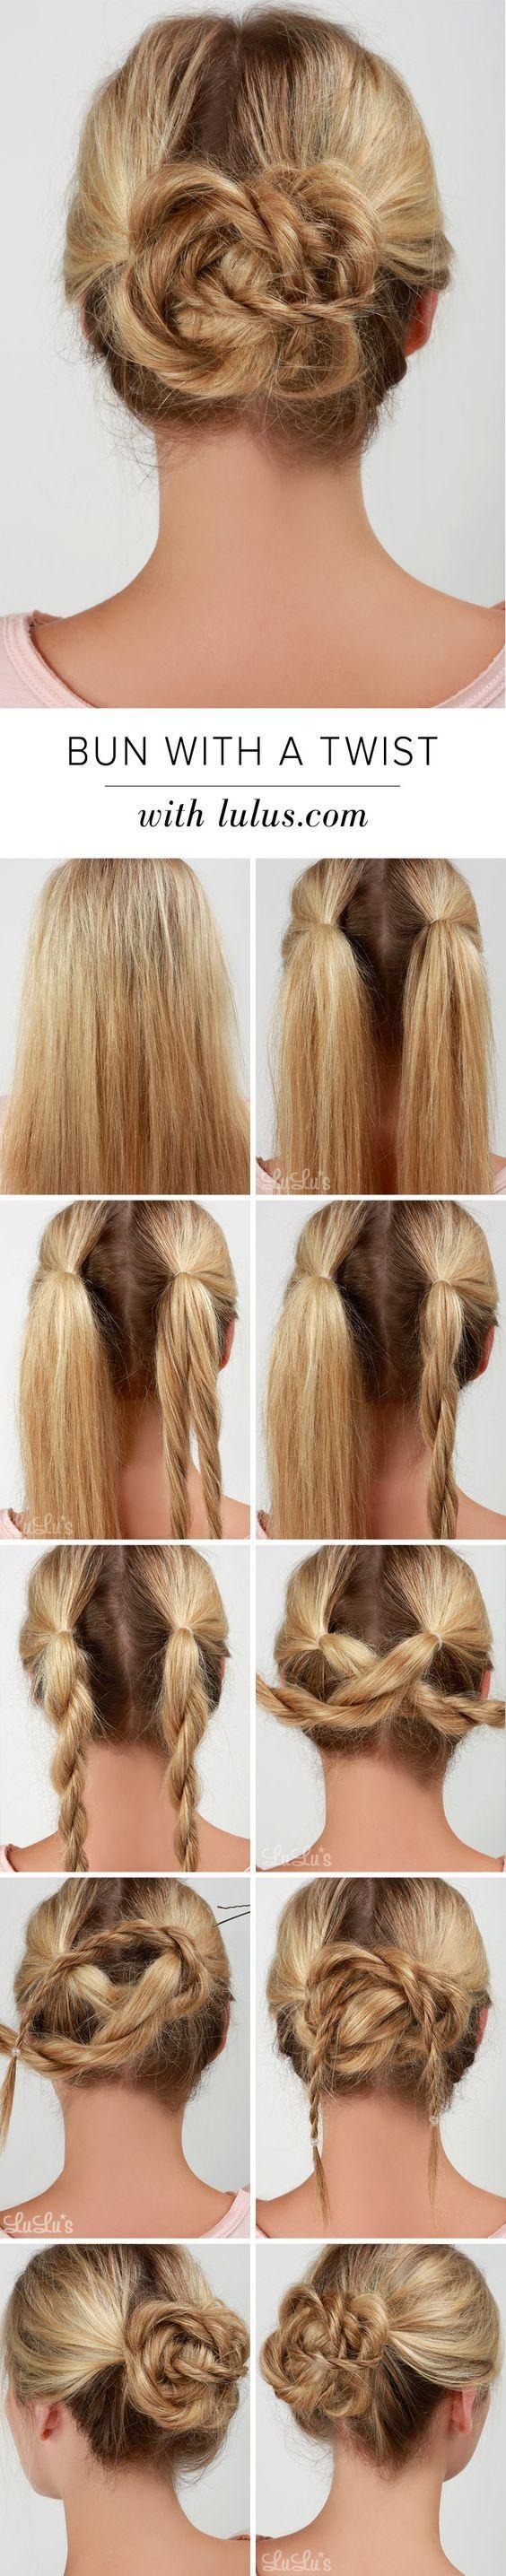 Super Easy Bun Hairstyles Easy Bun And Bun Hairstyles On Pinterest Short Hairstyles Gunalazisus